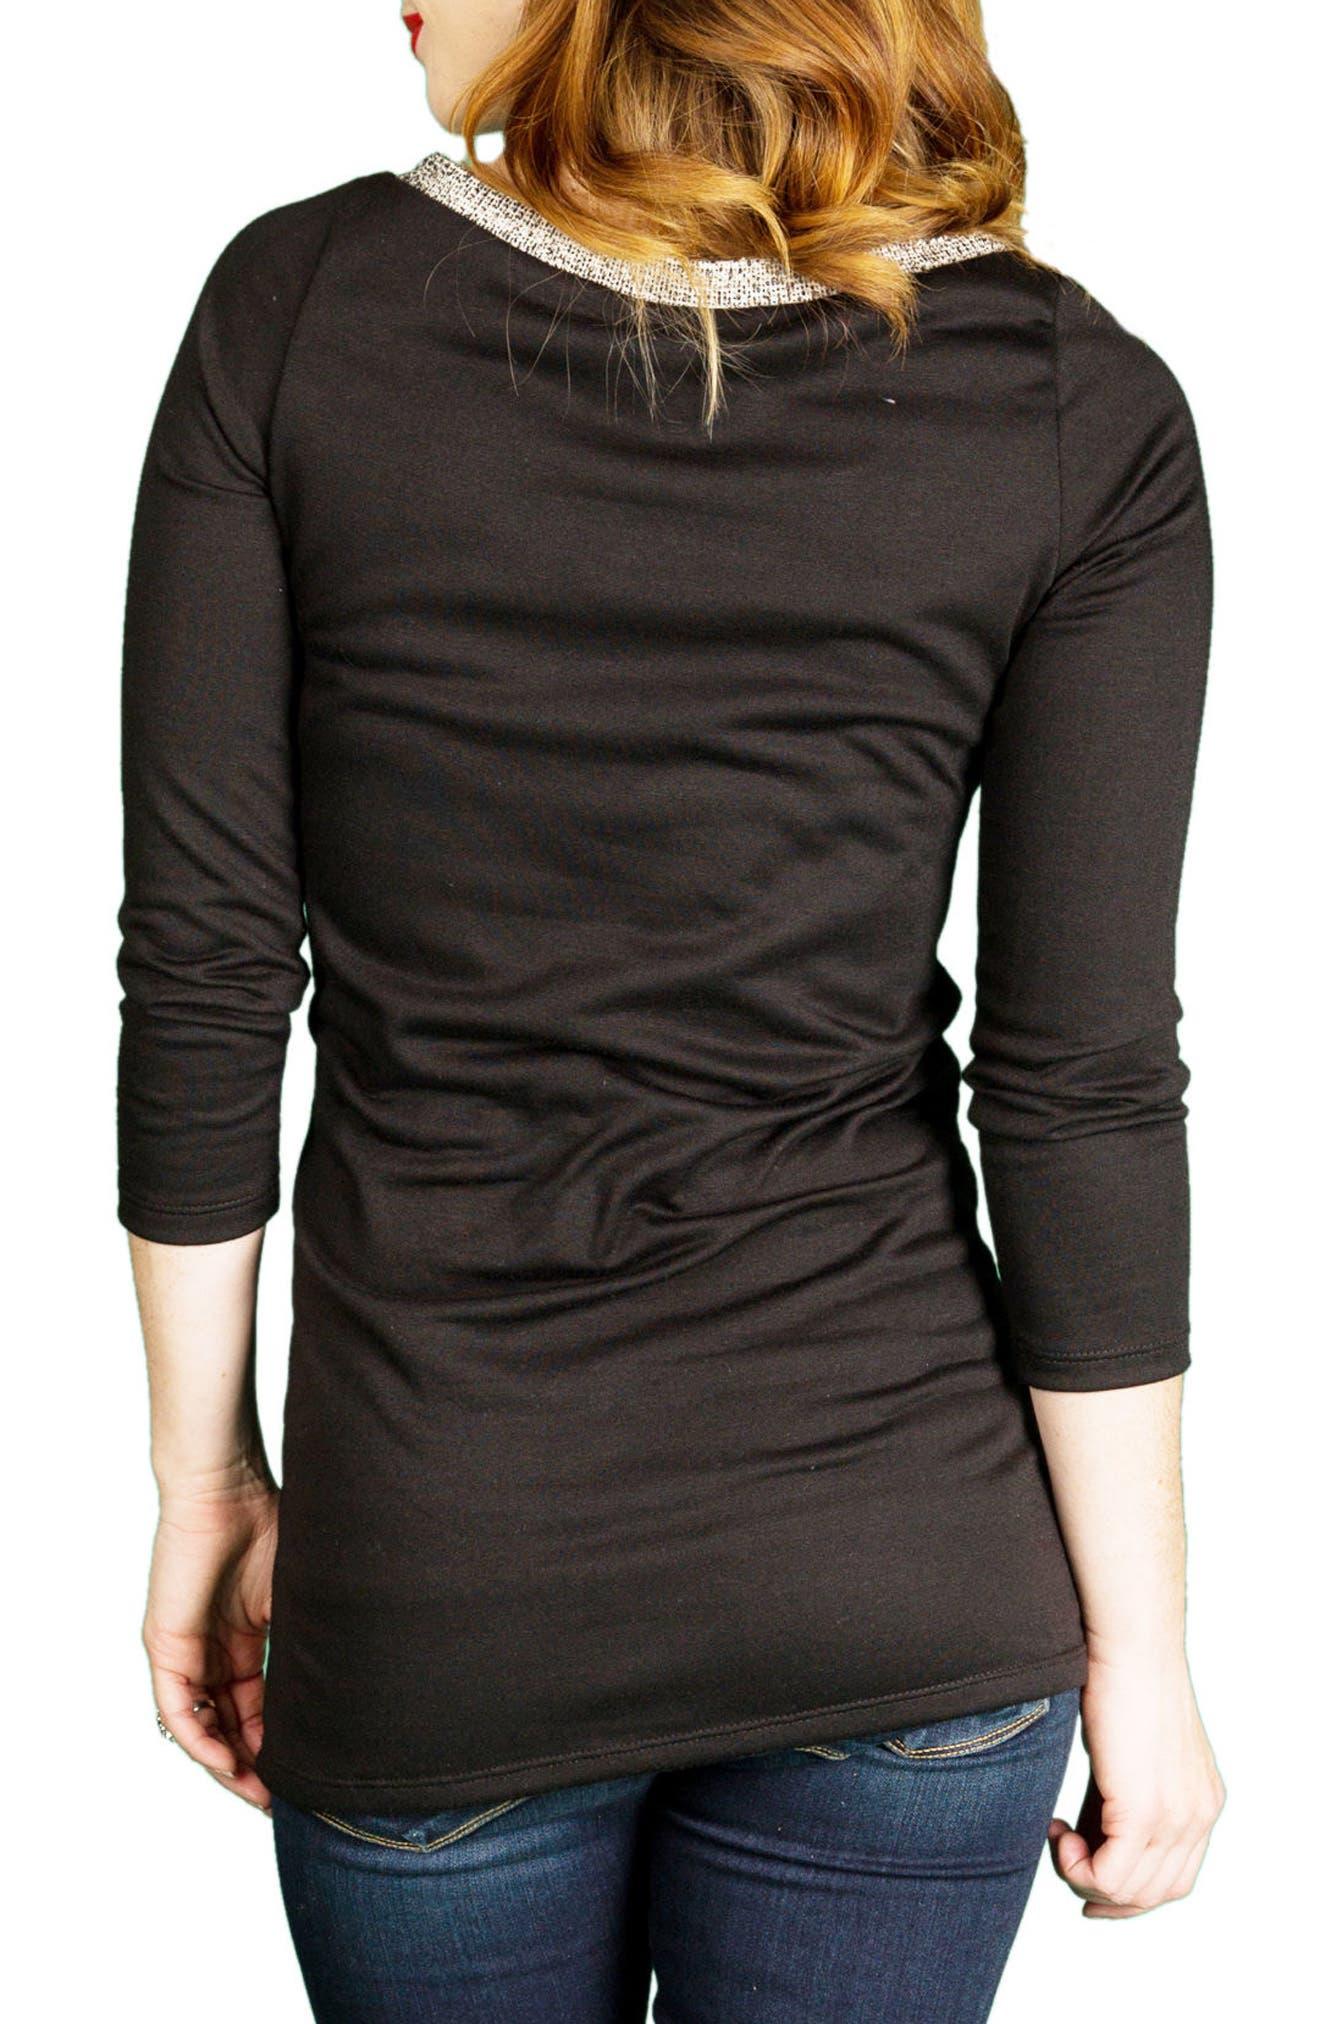 'Isla' Colorblock Maternity Tunic,                             Alternate thumbnail 2, color,                             Black Tweed